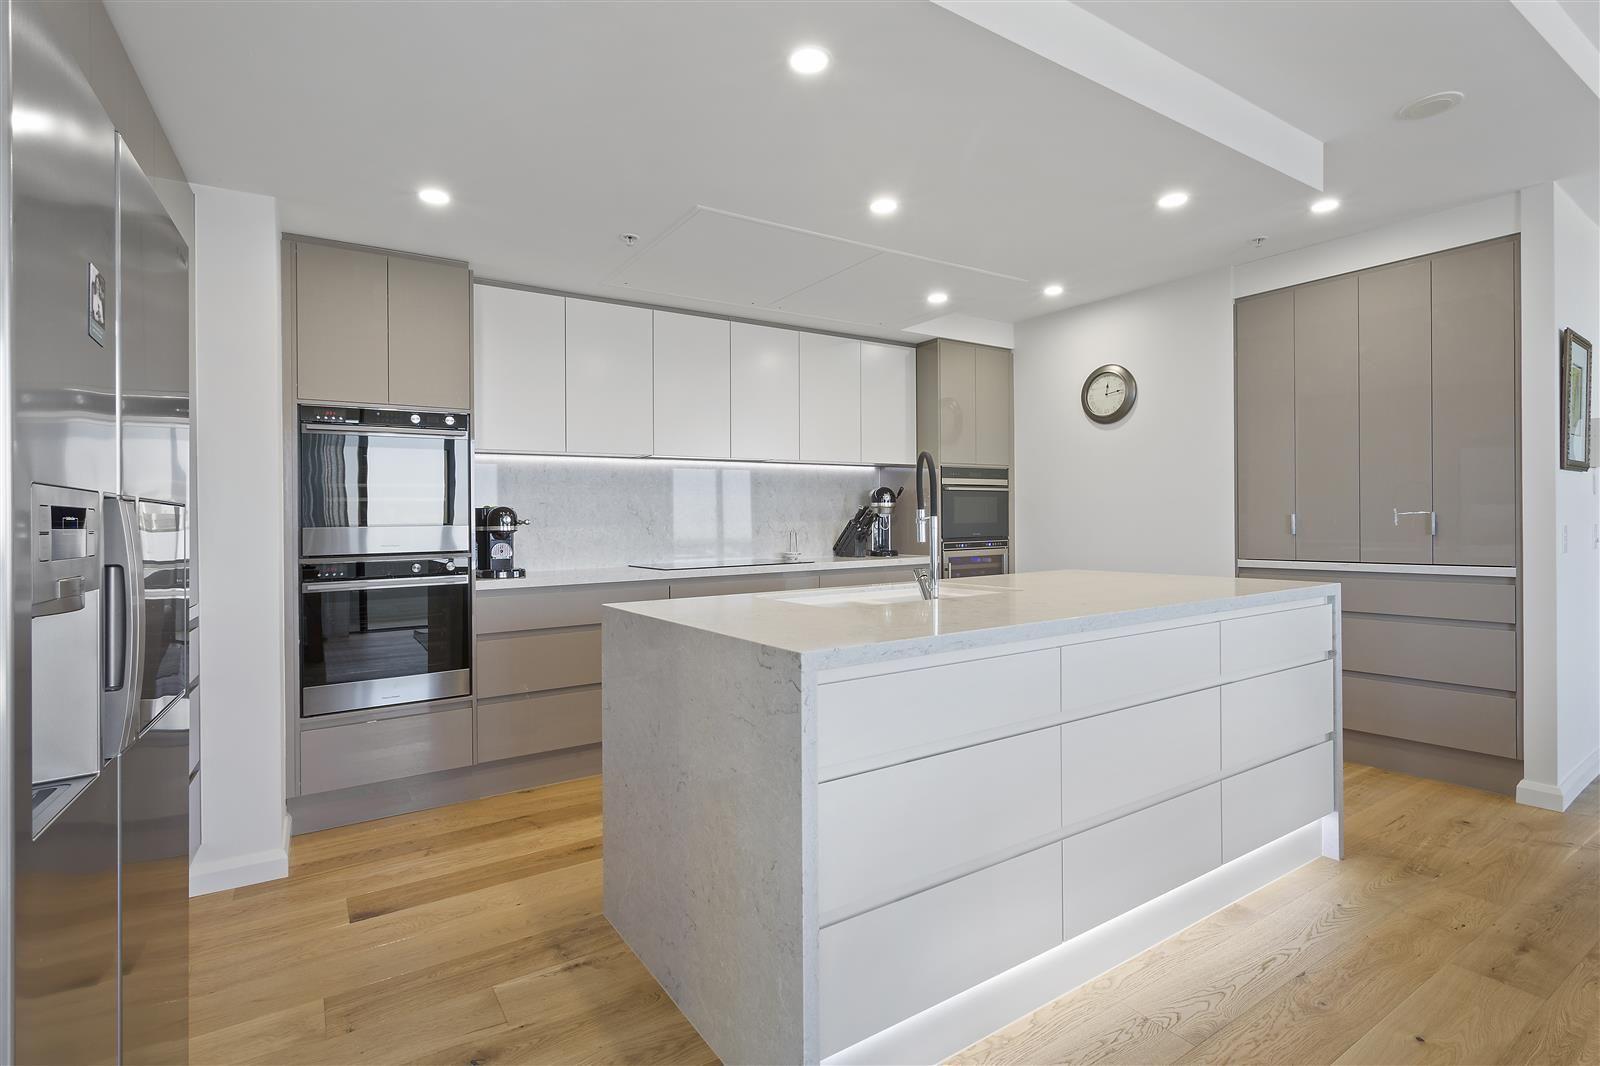 Unit Penthouse Renovation Gold Coast In 2020 Home Appliances